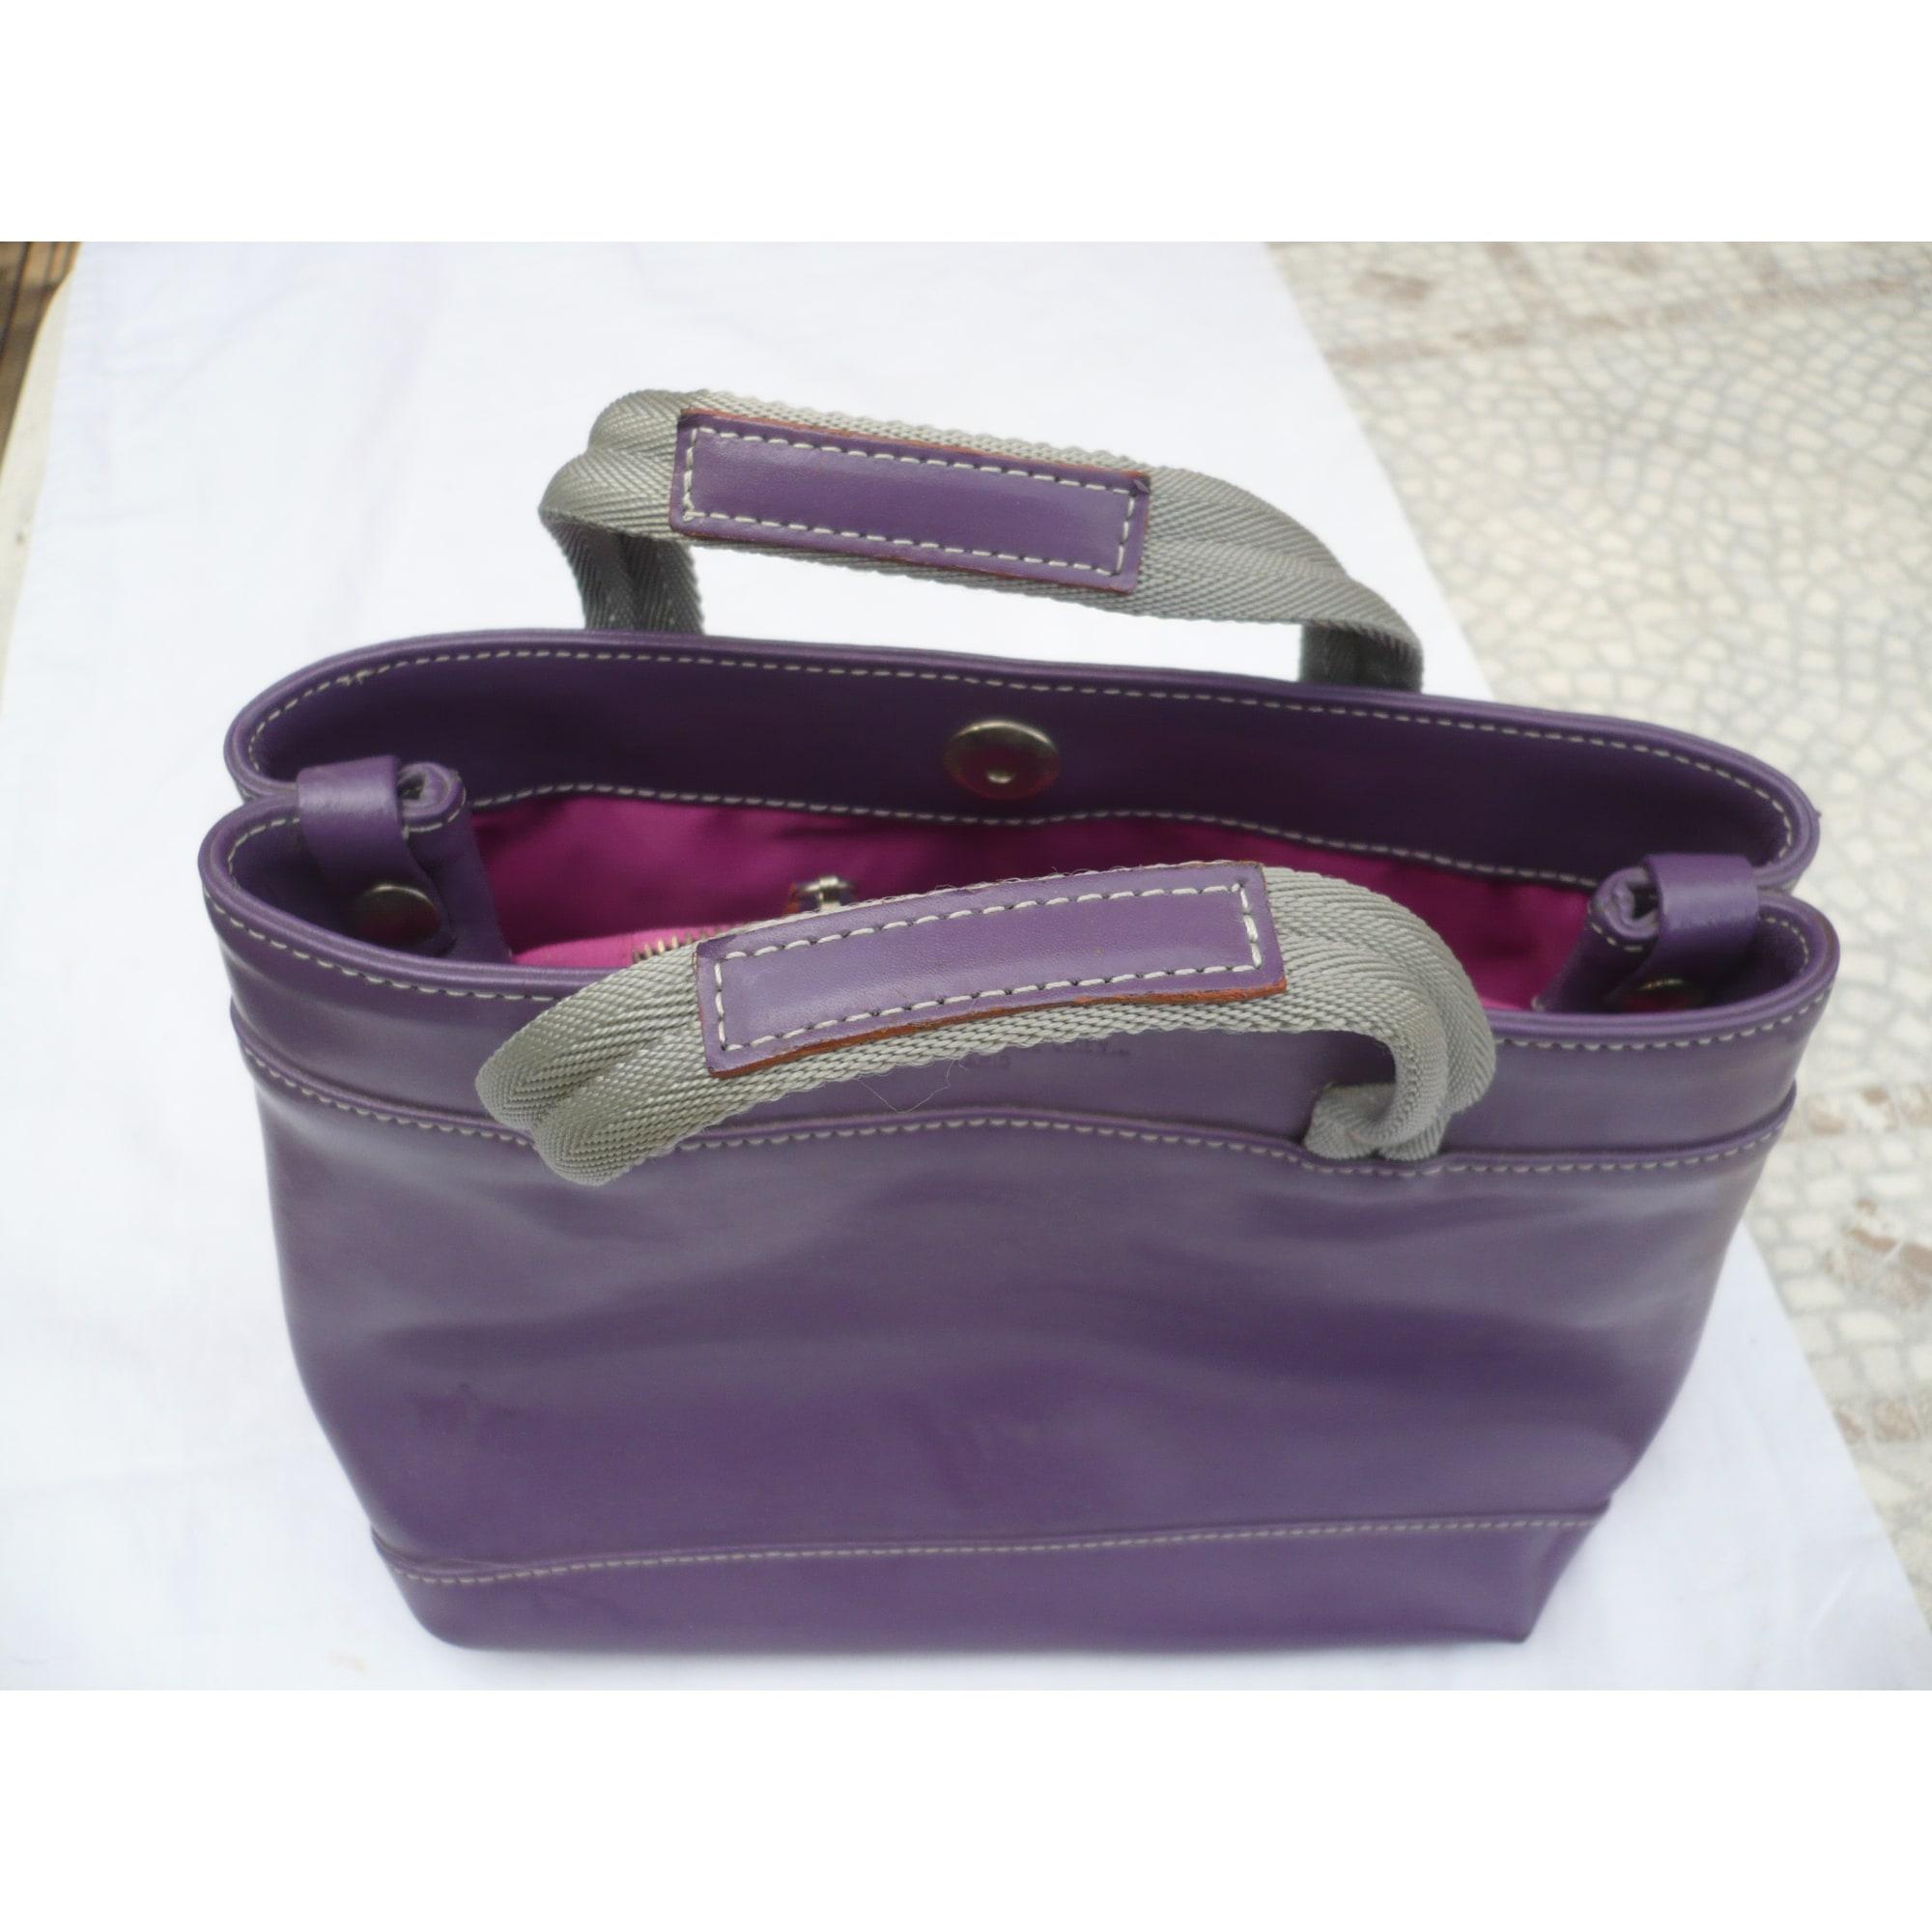 Sac à main en cuir UN APRES-MIDI DE CHIEN cuir violet